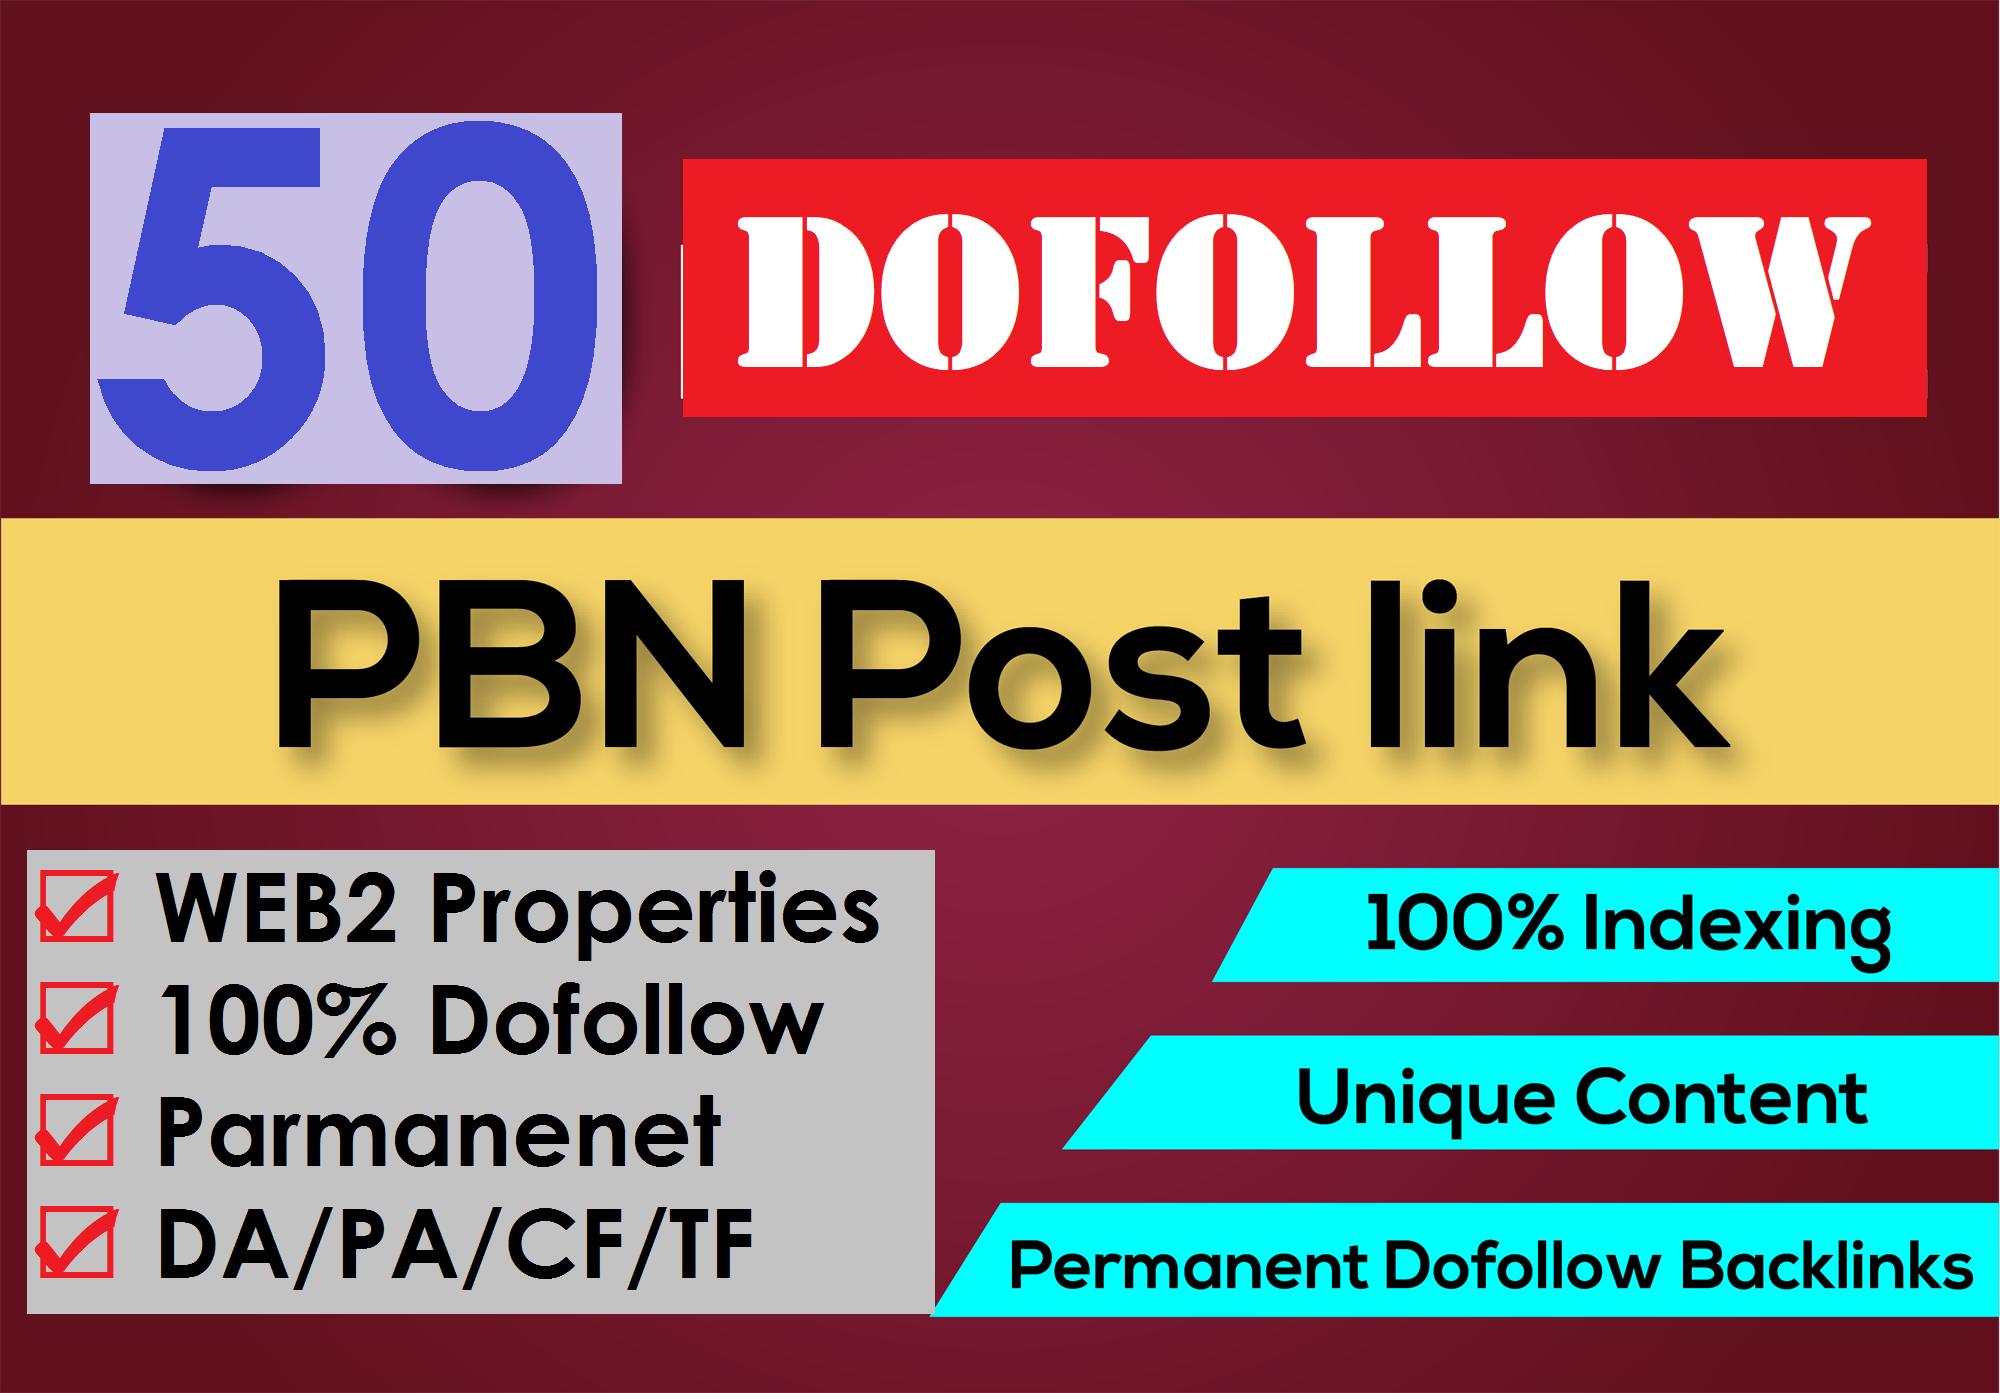 50 PBN blog post from High DA PA TF CF Dofol_ow Web2 Properties Link Building Service